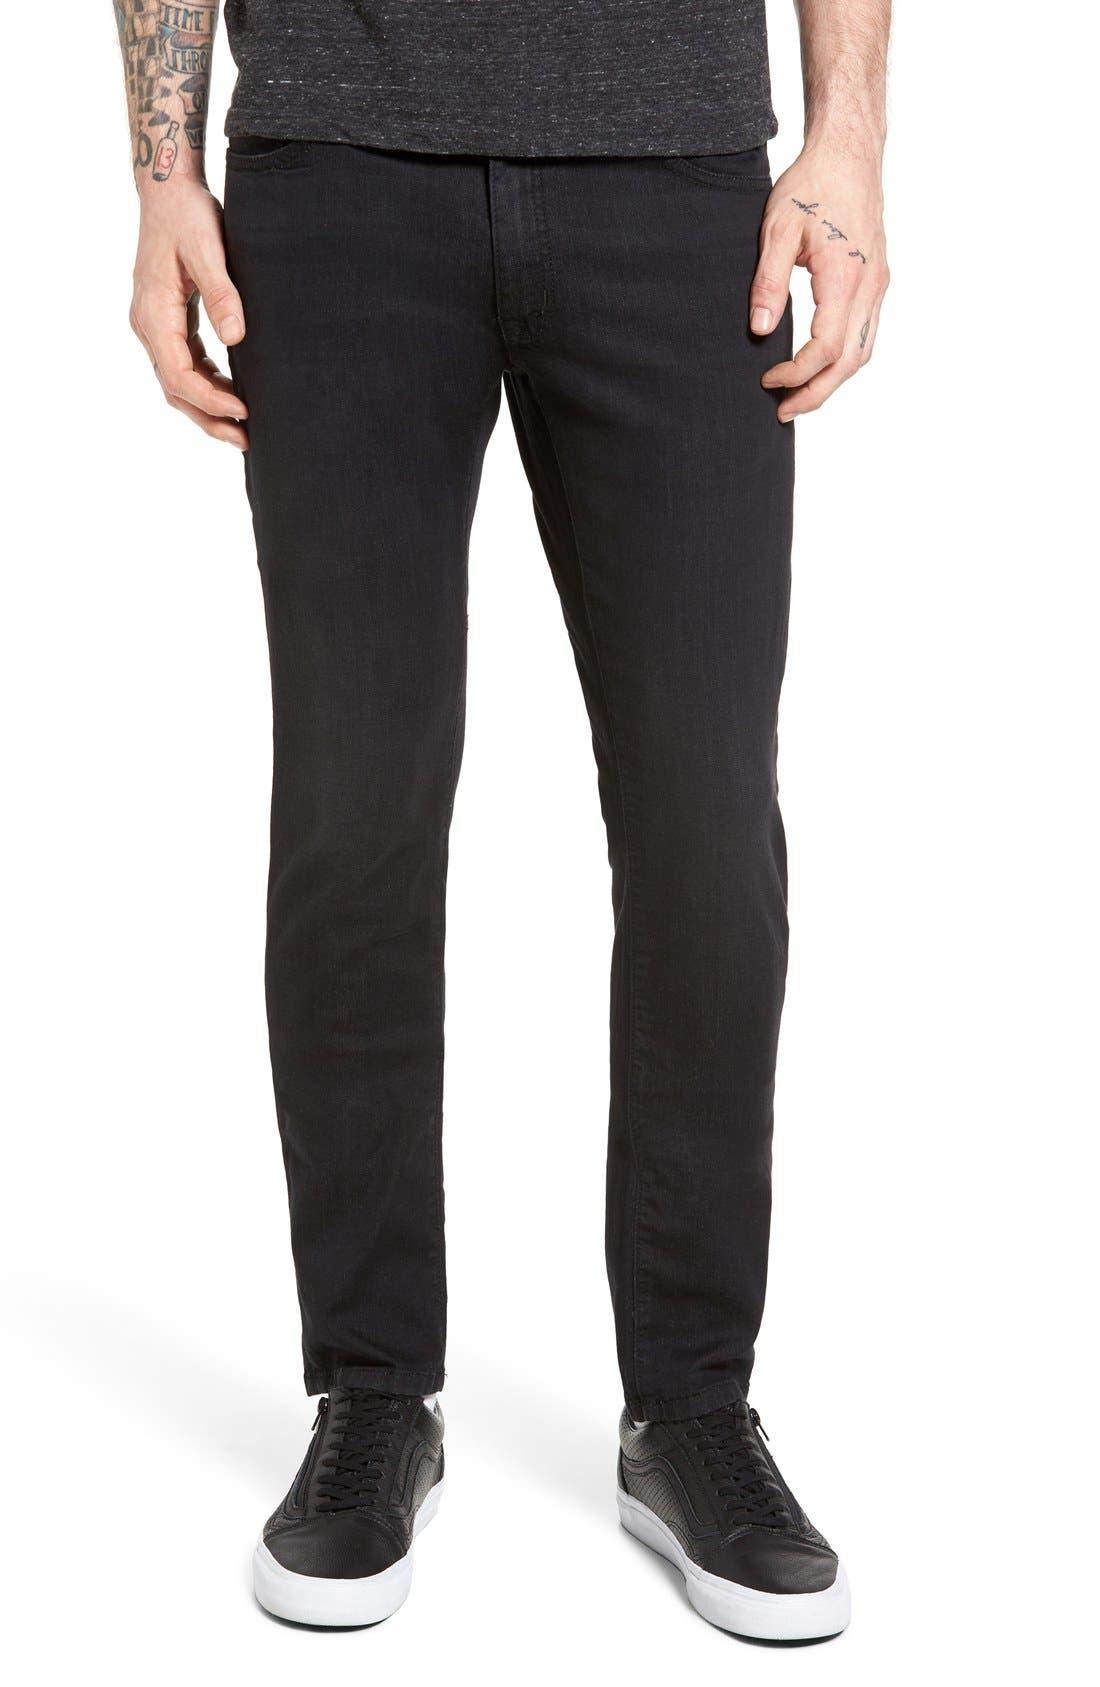 Torino Slim Fit Jeans,                             Main thumbnail 1, color,                             001